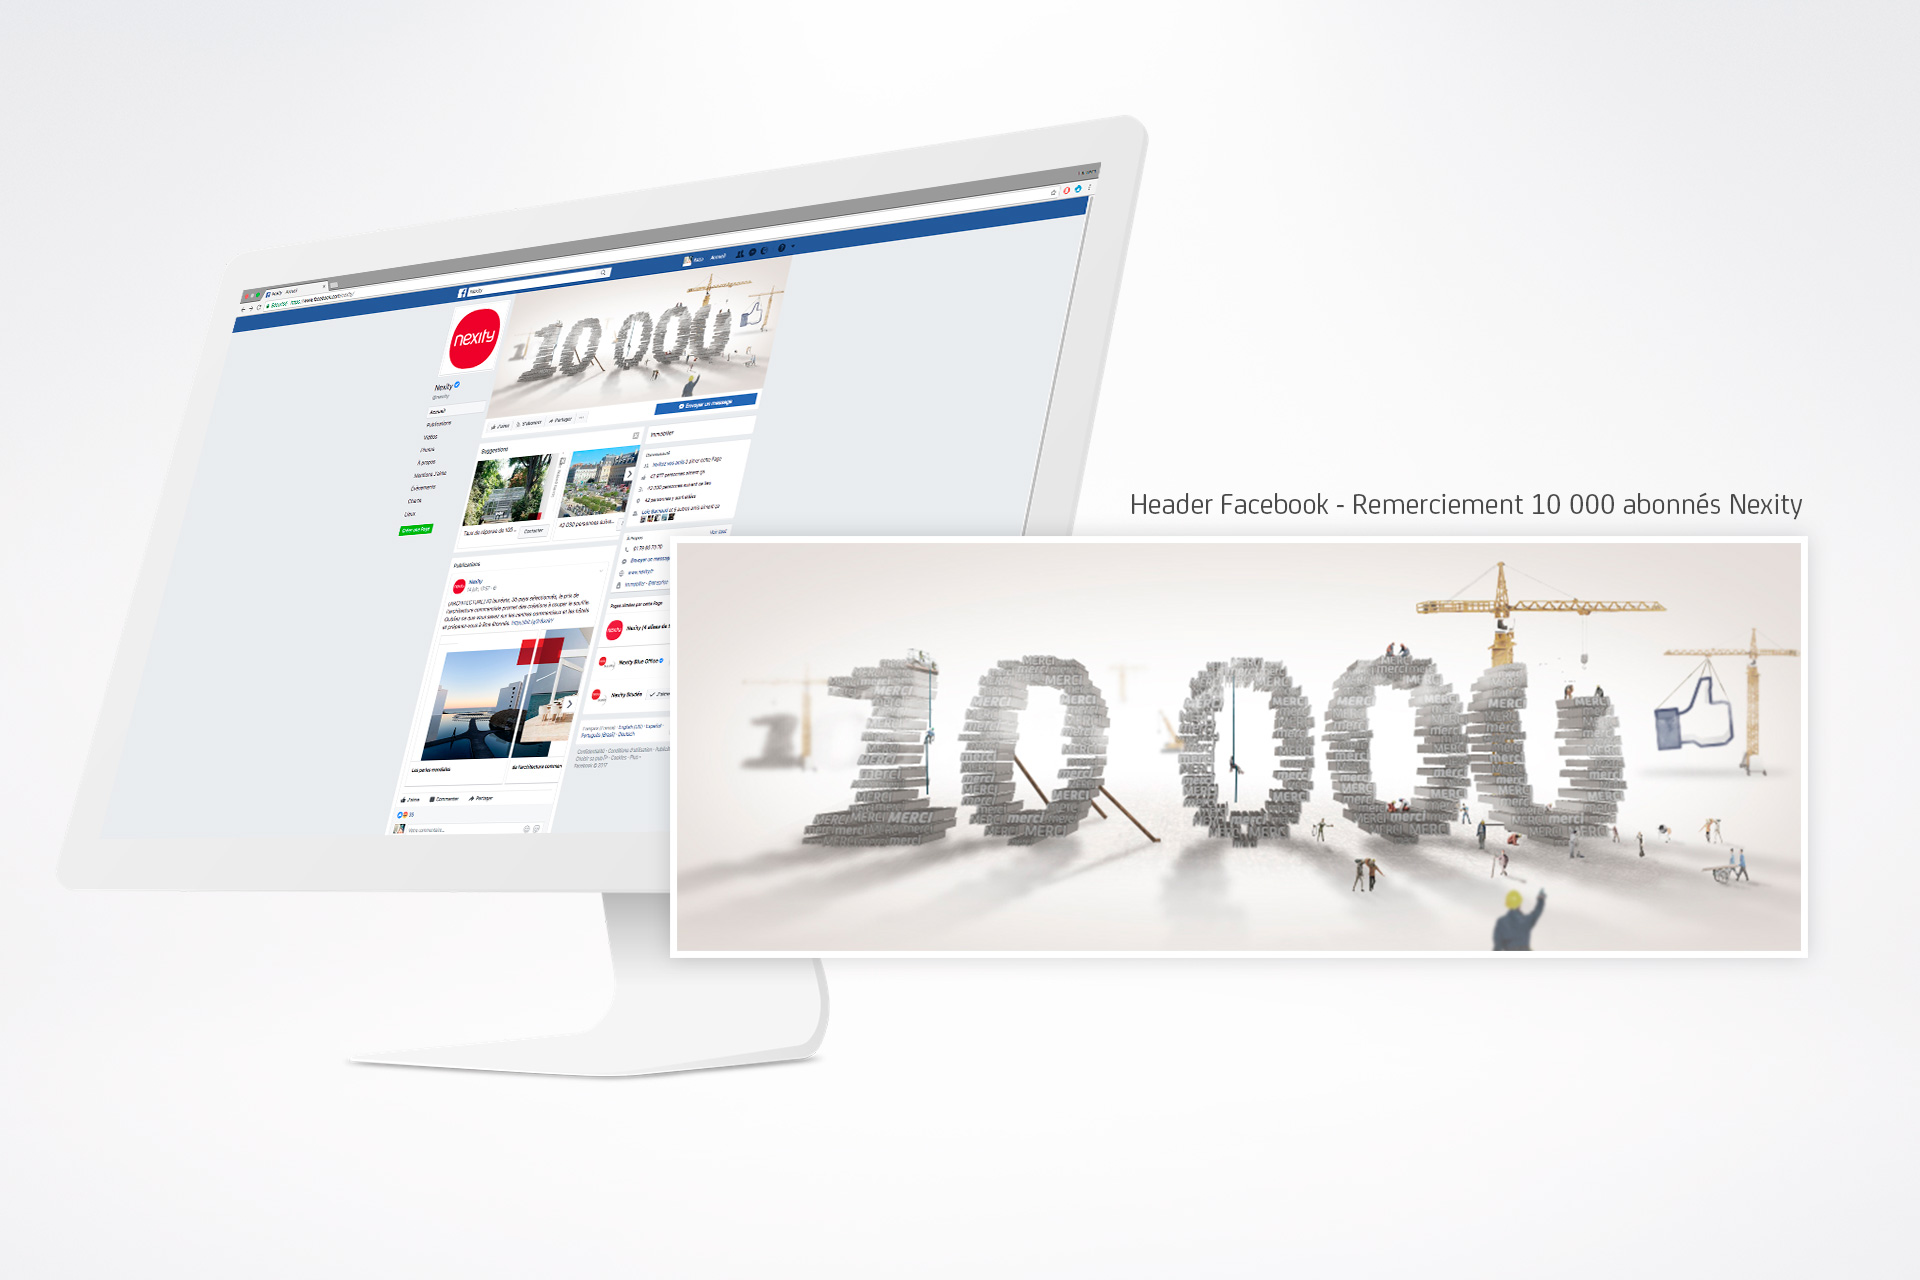 Header Facebook - Remerciement 10 000 abonnées Nexity